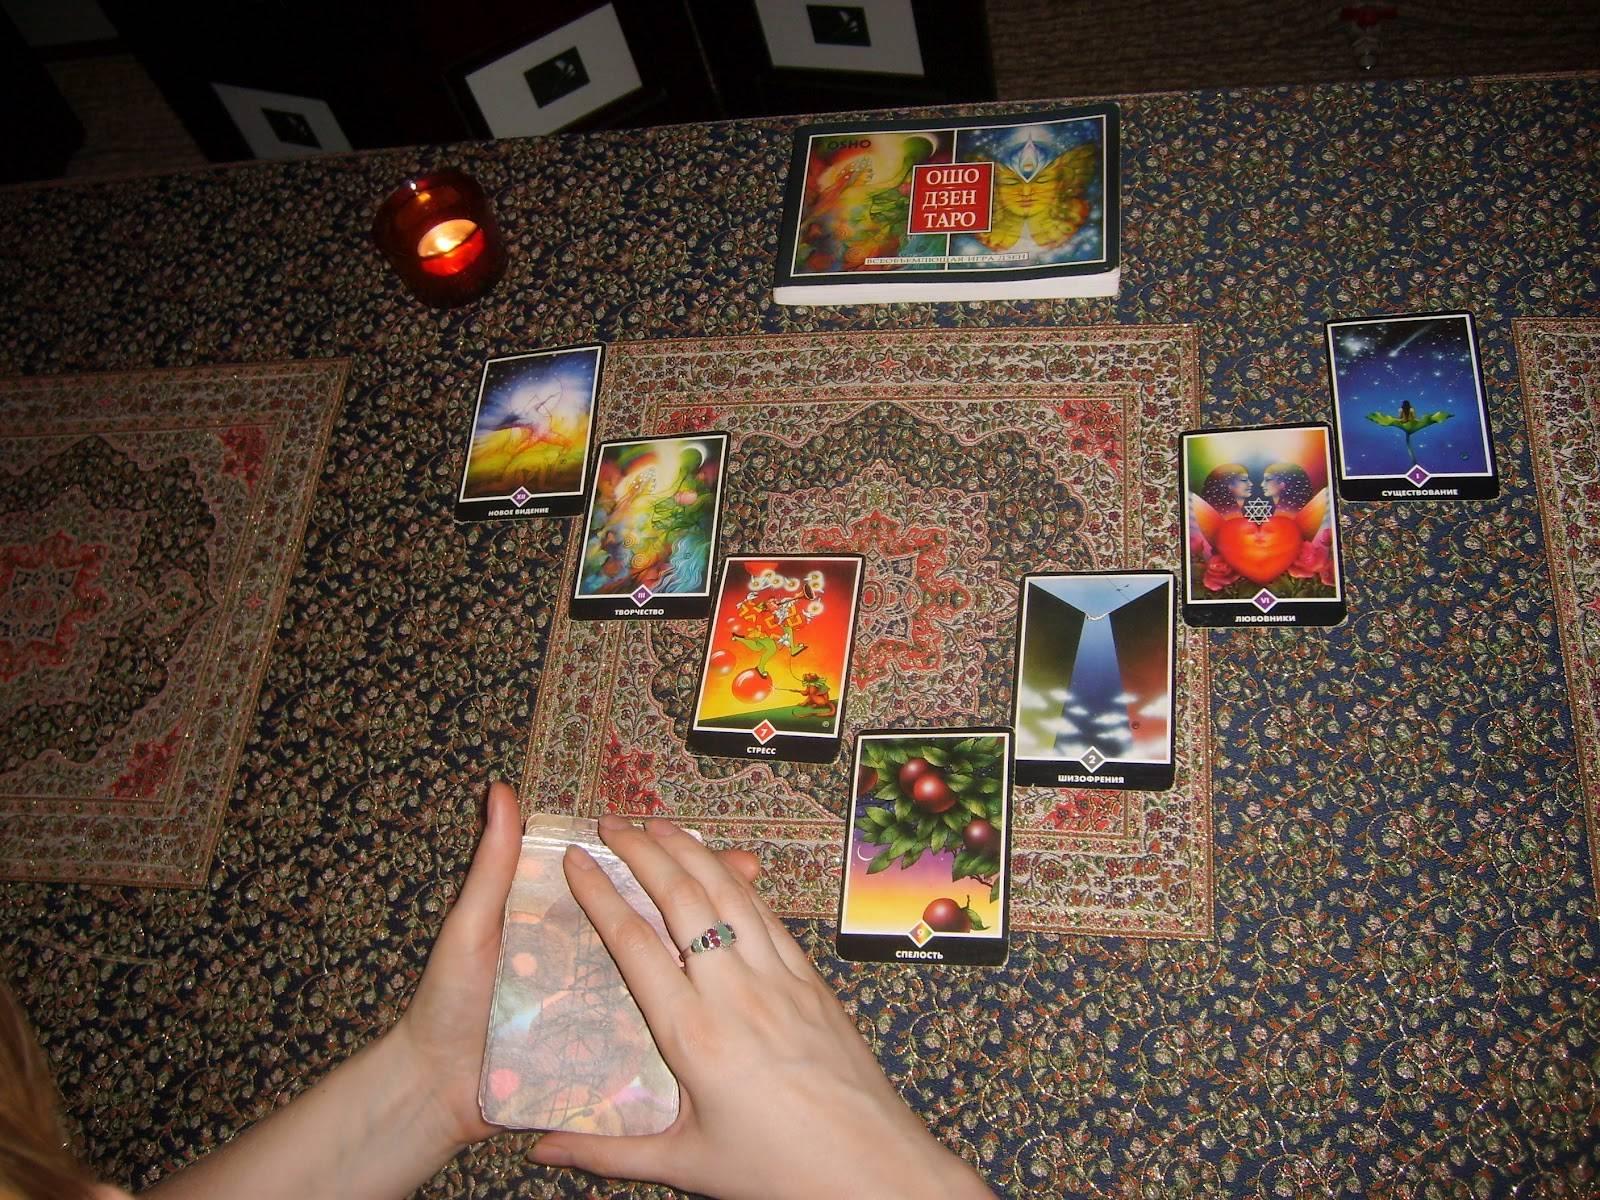 Творчество ошо дзен таро: общее значение и описание карты